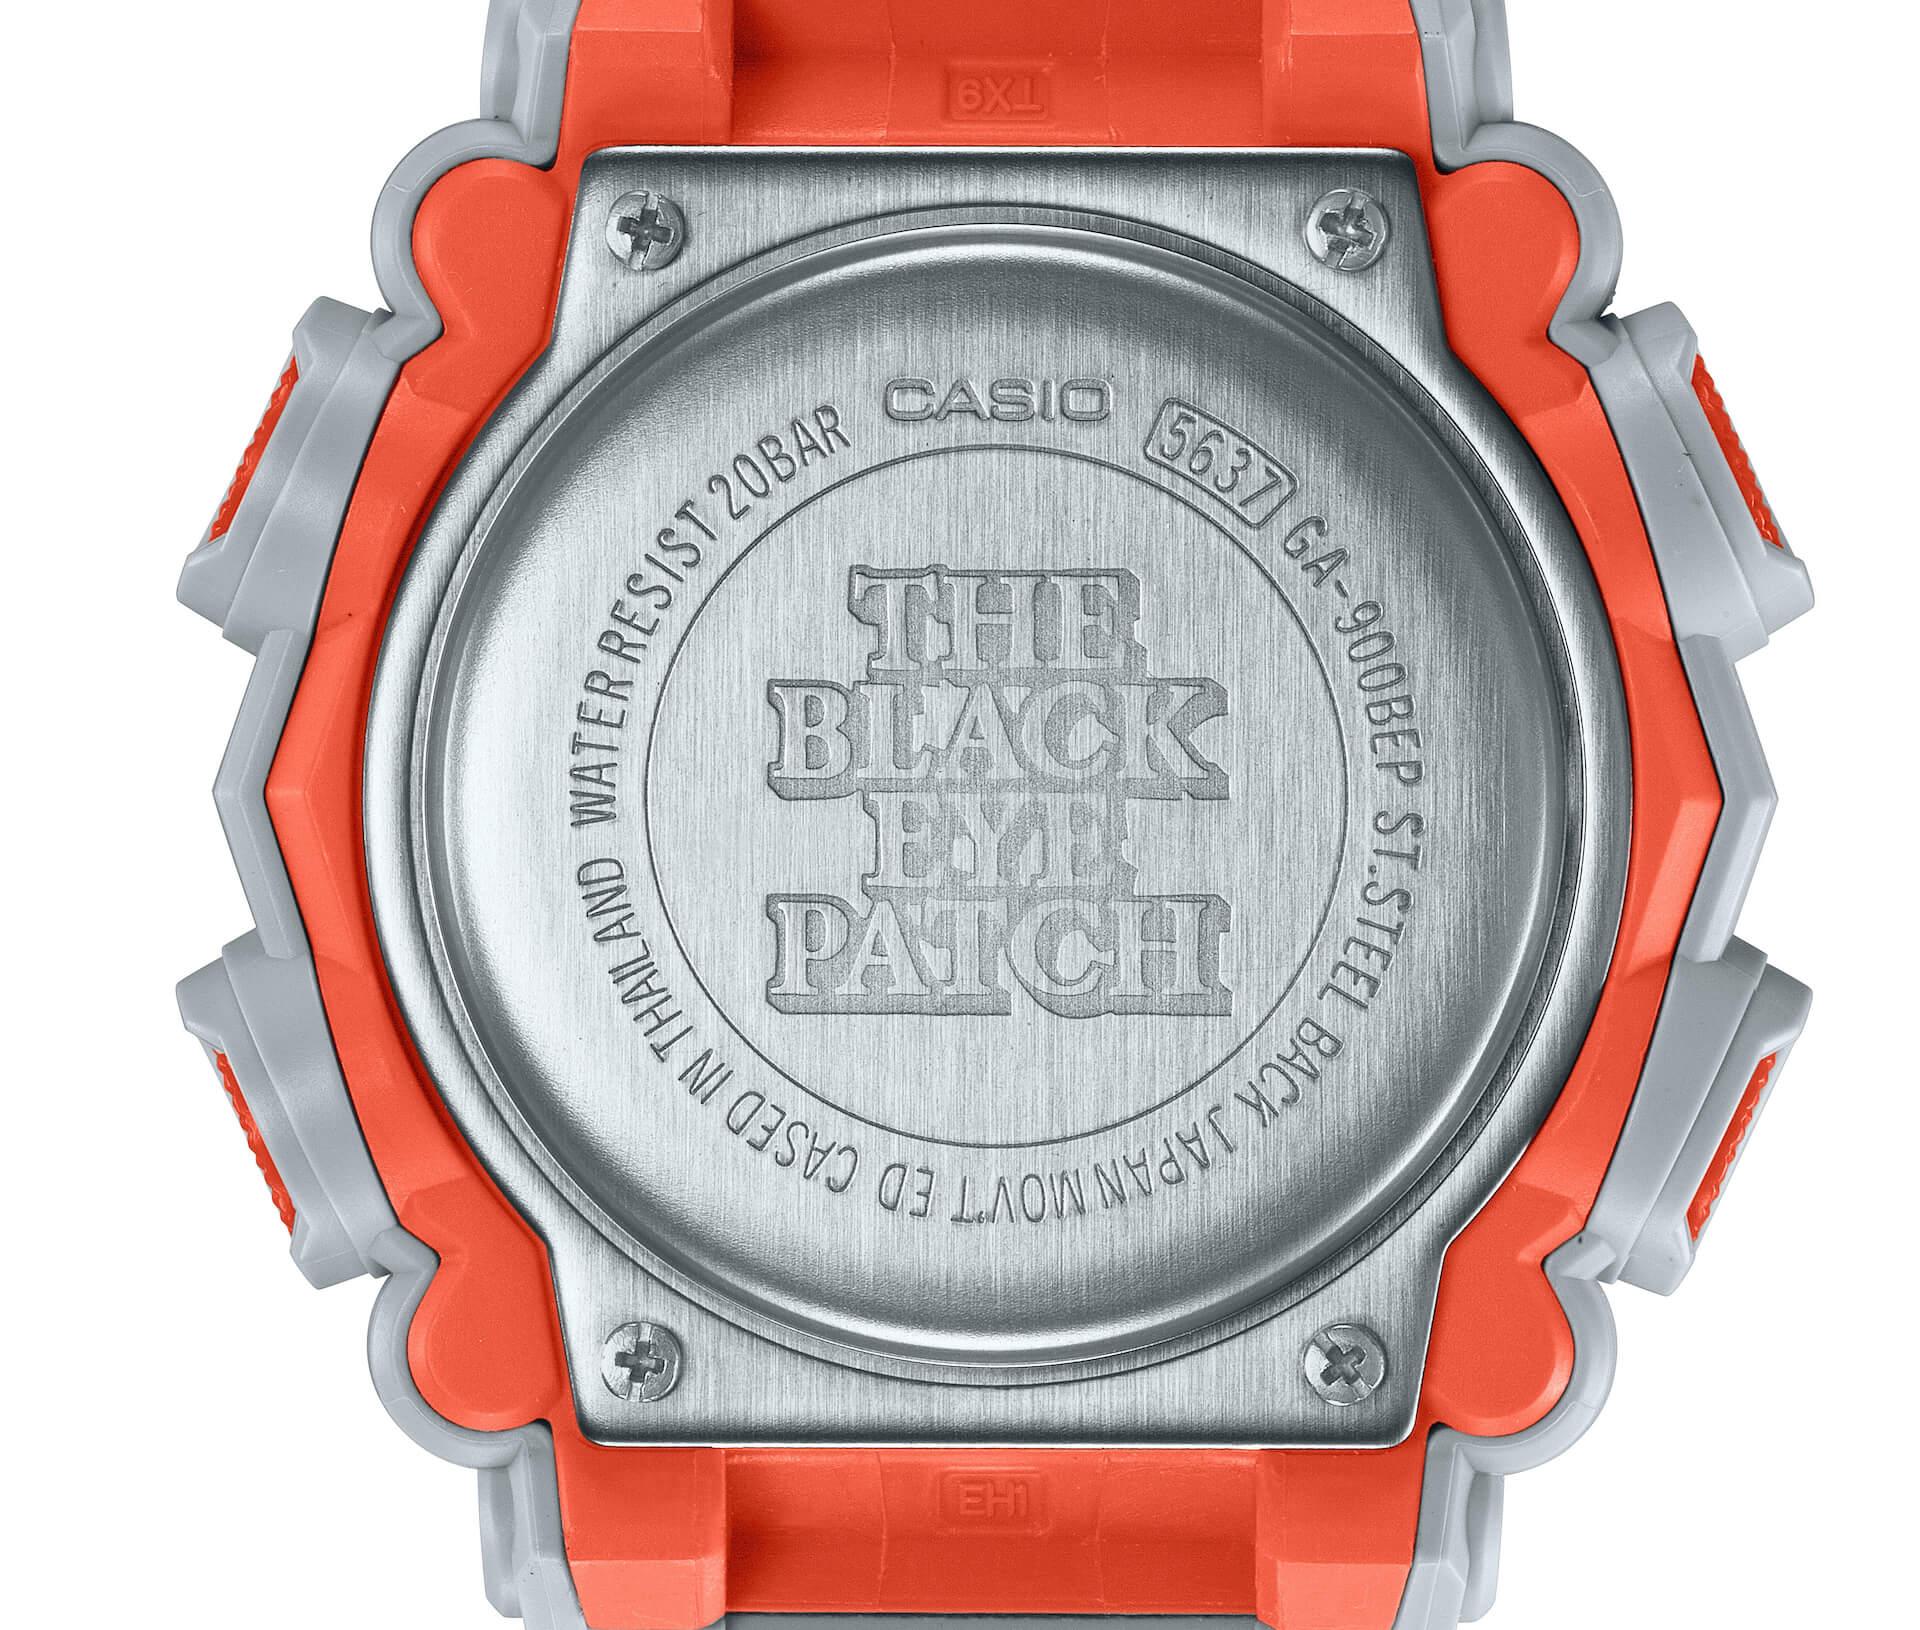 G-SHOCKとBlackEyePatchの新たなコラボモデル「GA-900BEP-8AJR」が発売決定!バンド交換可能なスタイリッシュなモデル tech210830_gshock_blackeyepatch_3